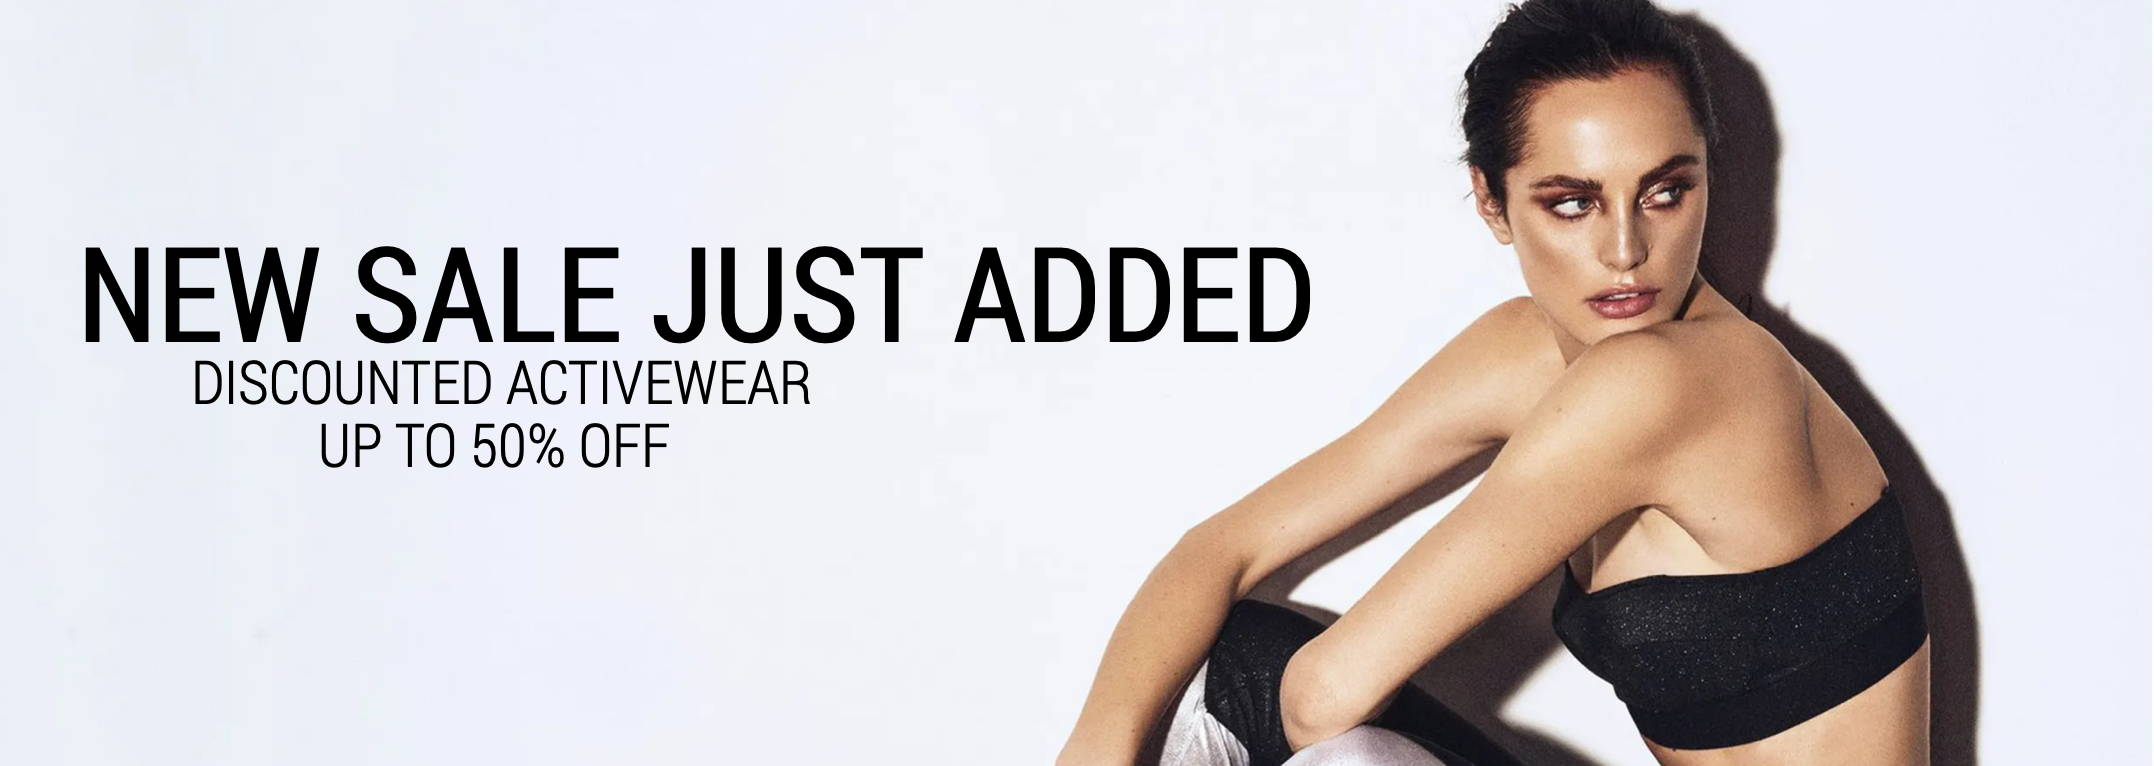 Shop New Sale Activewear SPORTLES.com